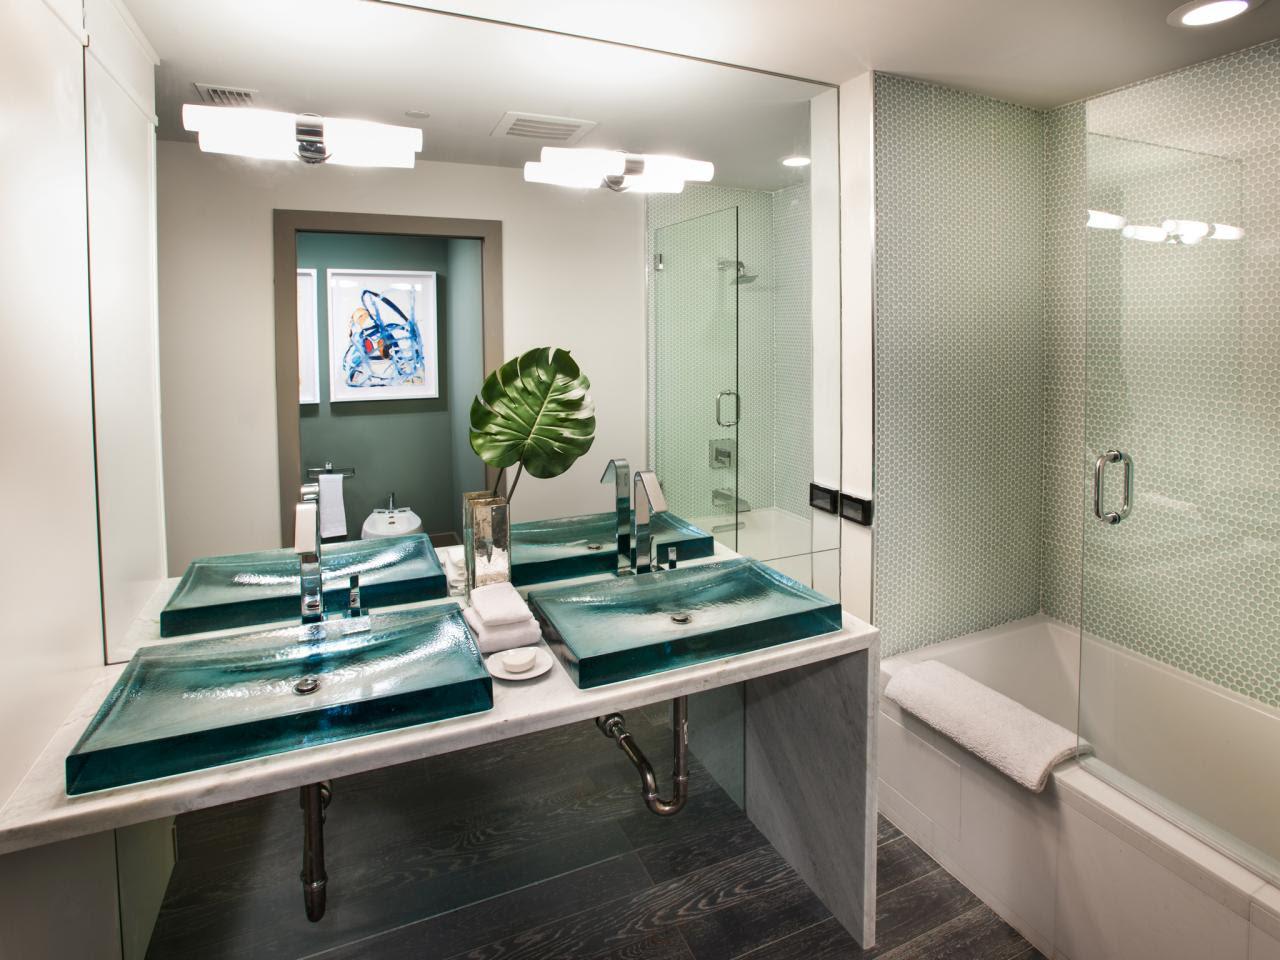 Bathroom Vanities Ideas Design Ideas & Remodel Pictures ...